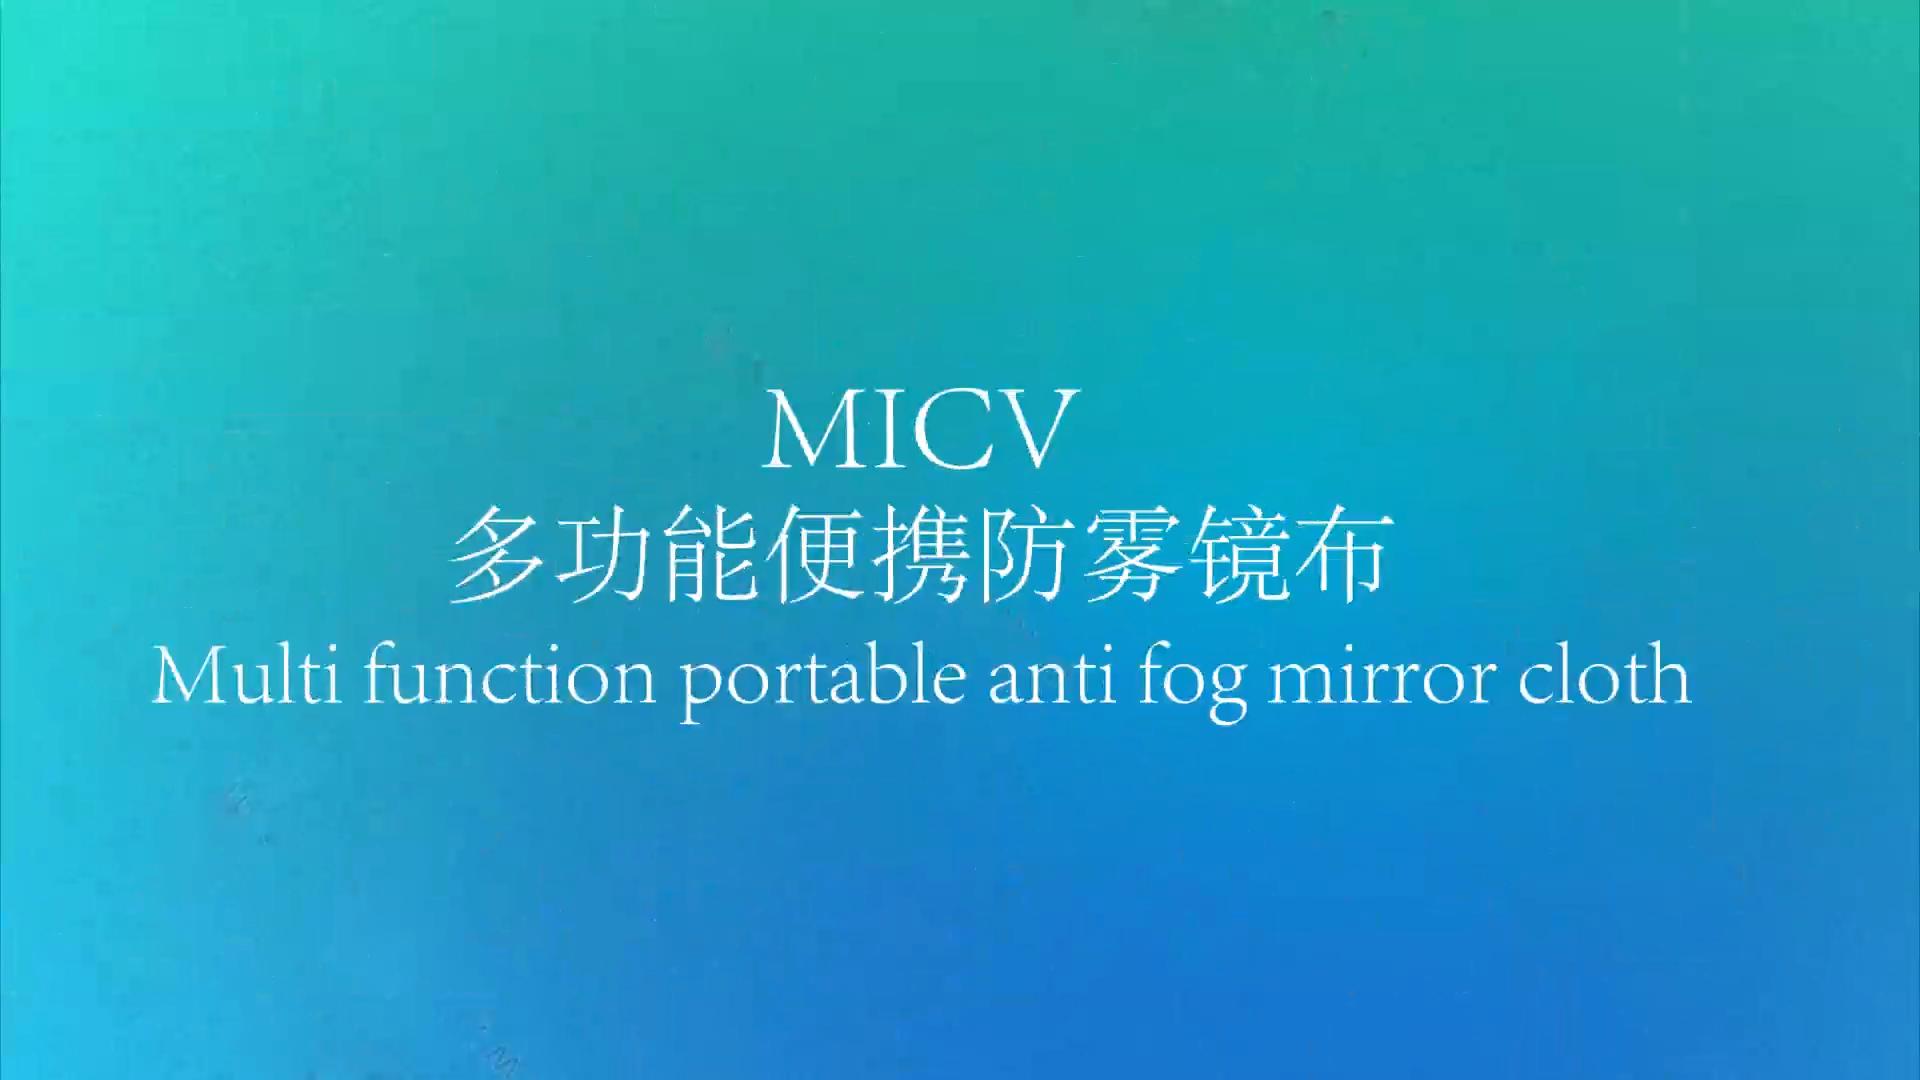 Kain Serat Mikro Layar Sentuh Anti-kabut, Kain Microfiber Harga Rendah Profesional Kualitas Tinggi